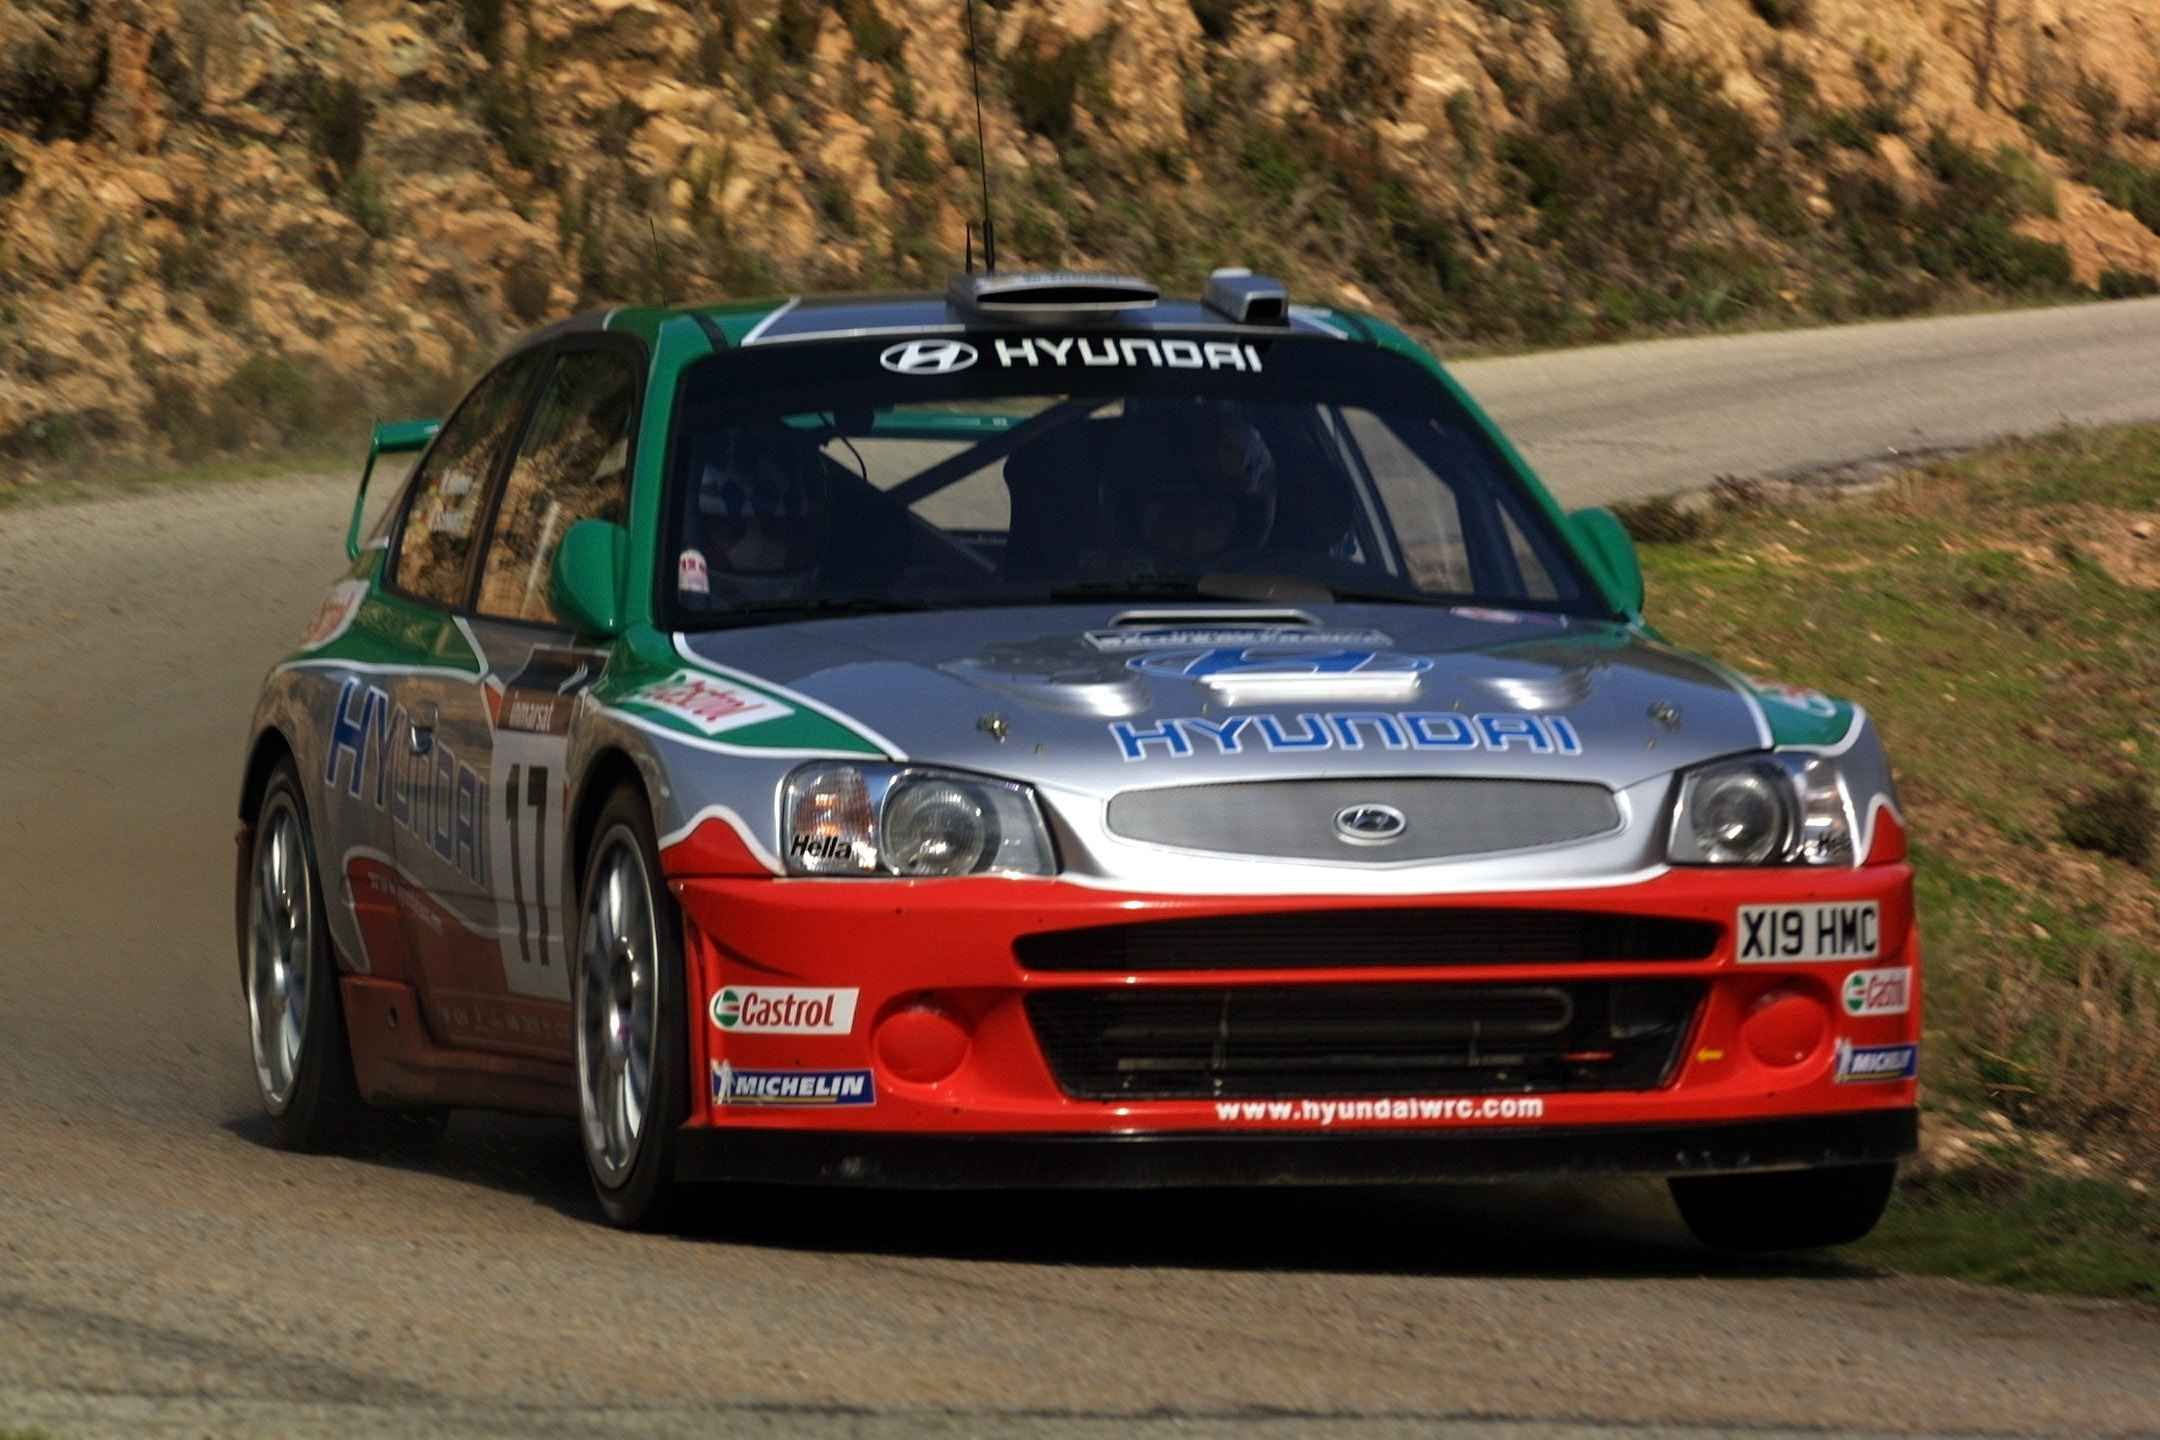 Hyundai Accent Wrc Sporty Cars Fast Rugged Cars Hyundai